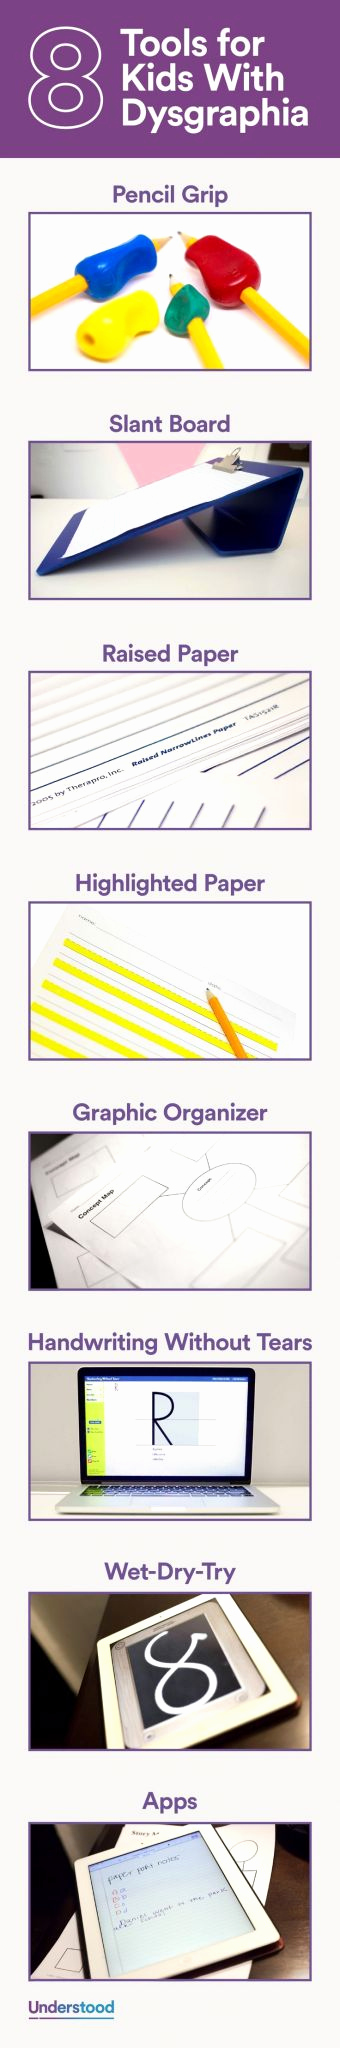 Fingerspelling Practice Worksheets Best Of Fingerspelling Practice Worksheets